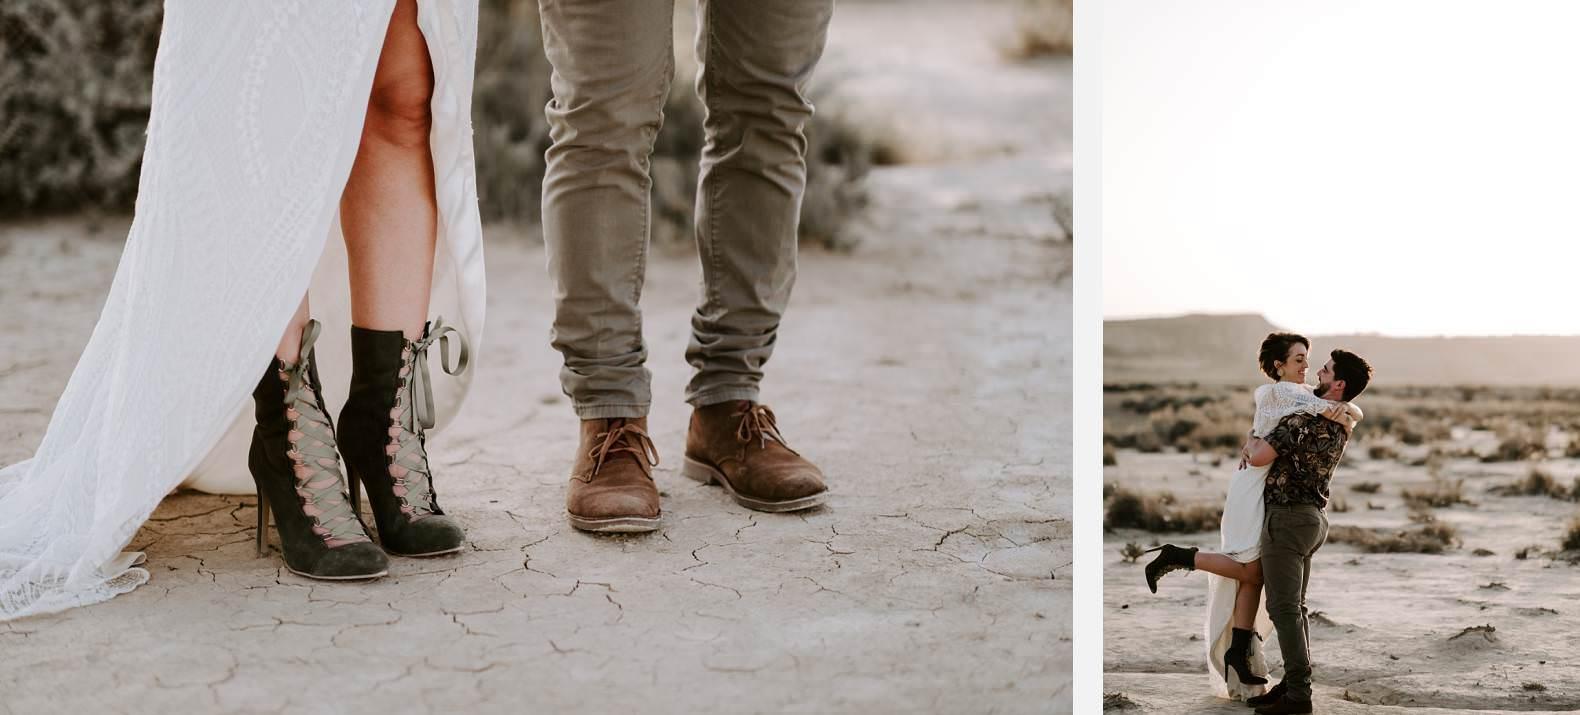 mariage espagne bardenas festival you and me elopement photographe bel esprit desert 0035